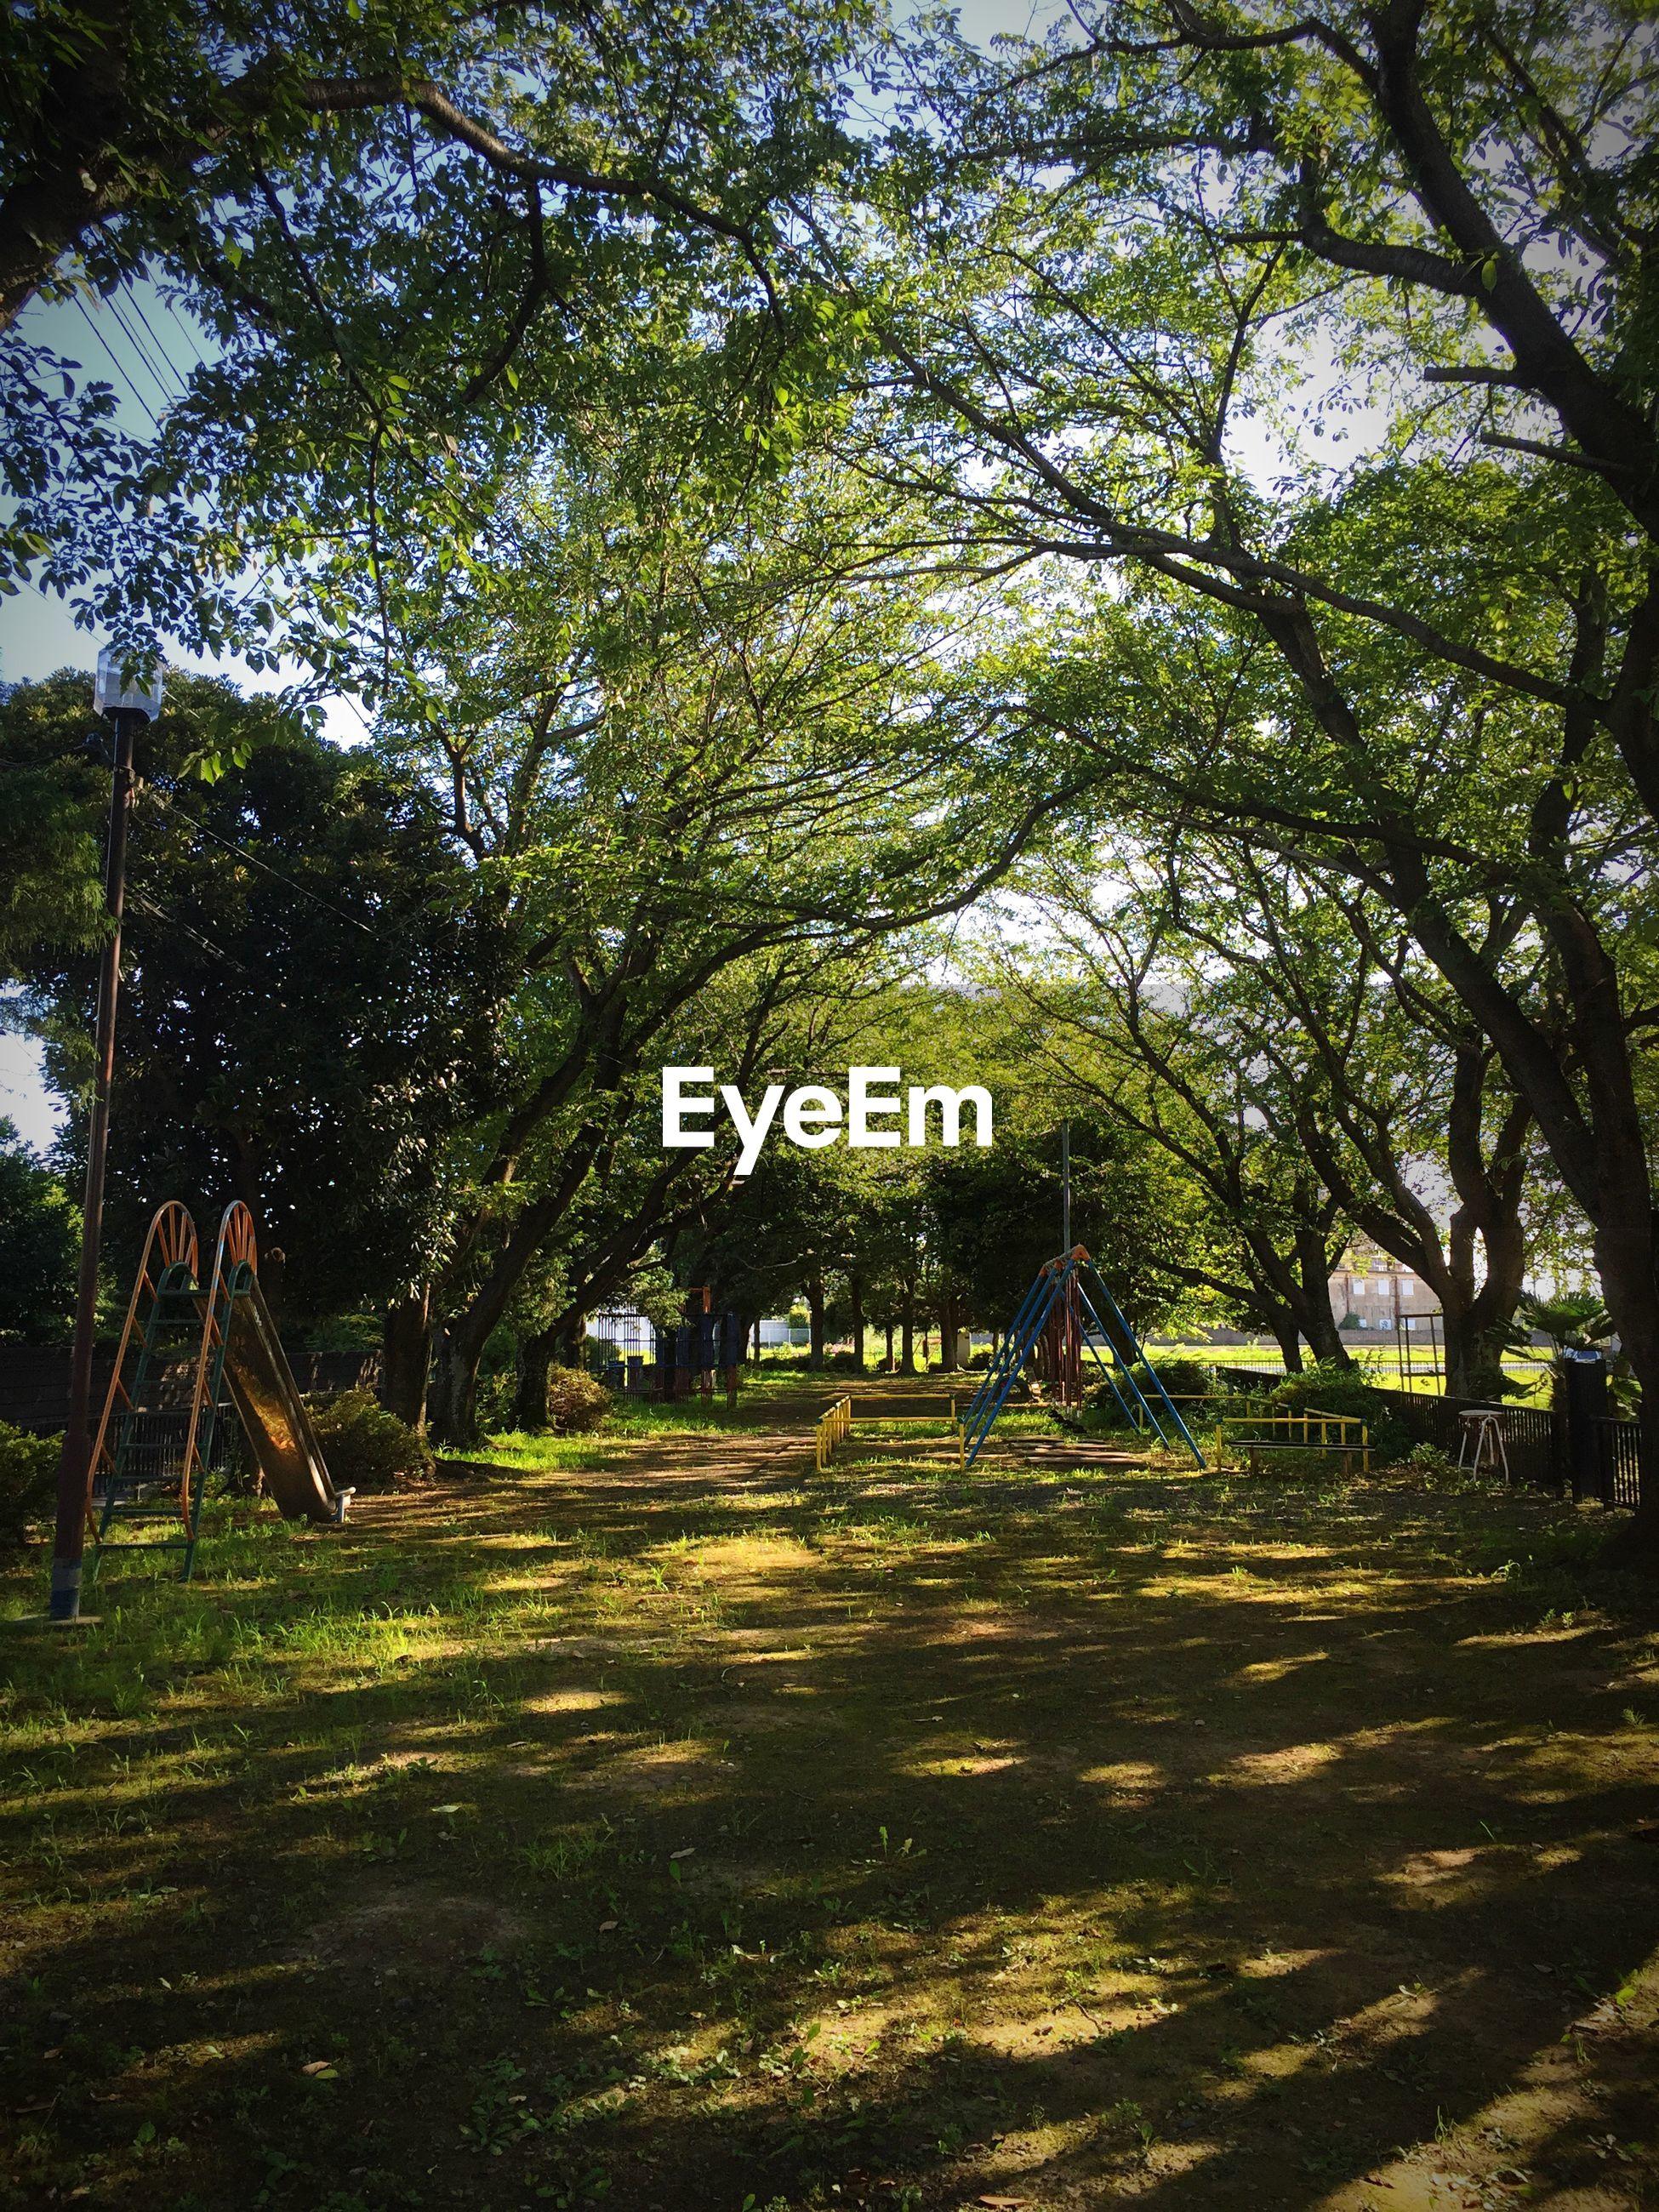 Slides amidst trees on playground